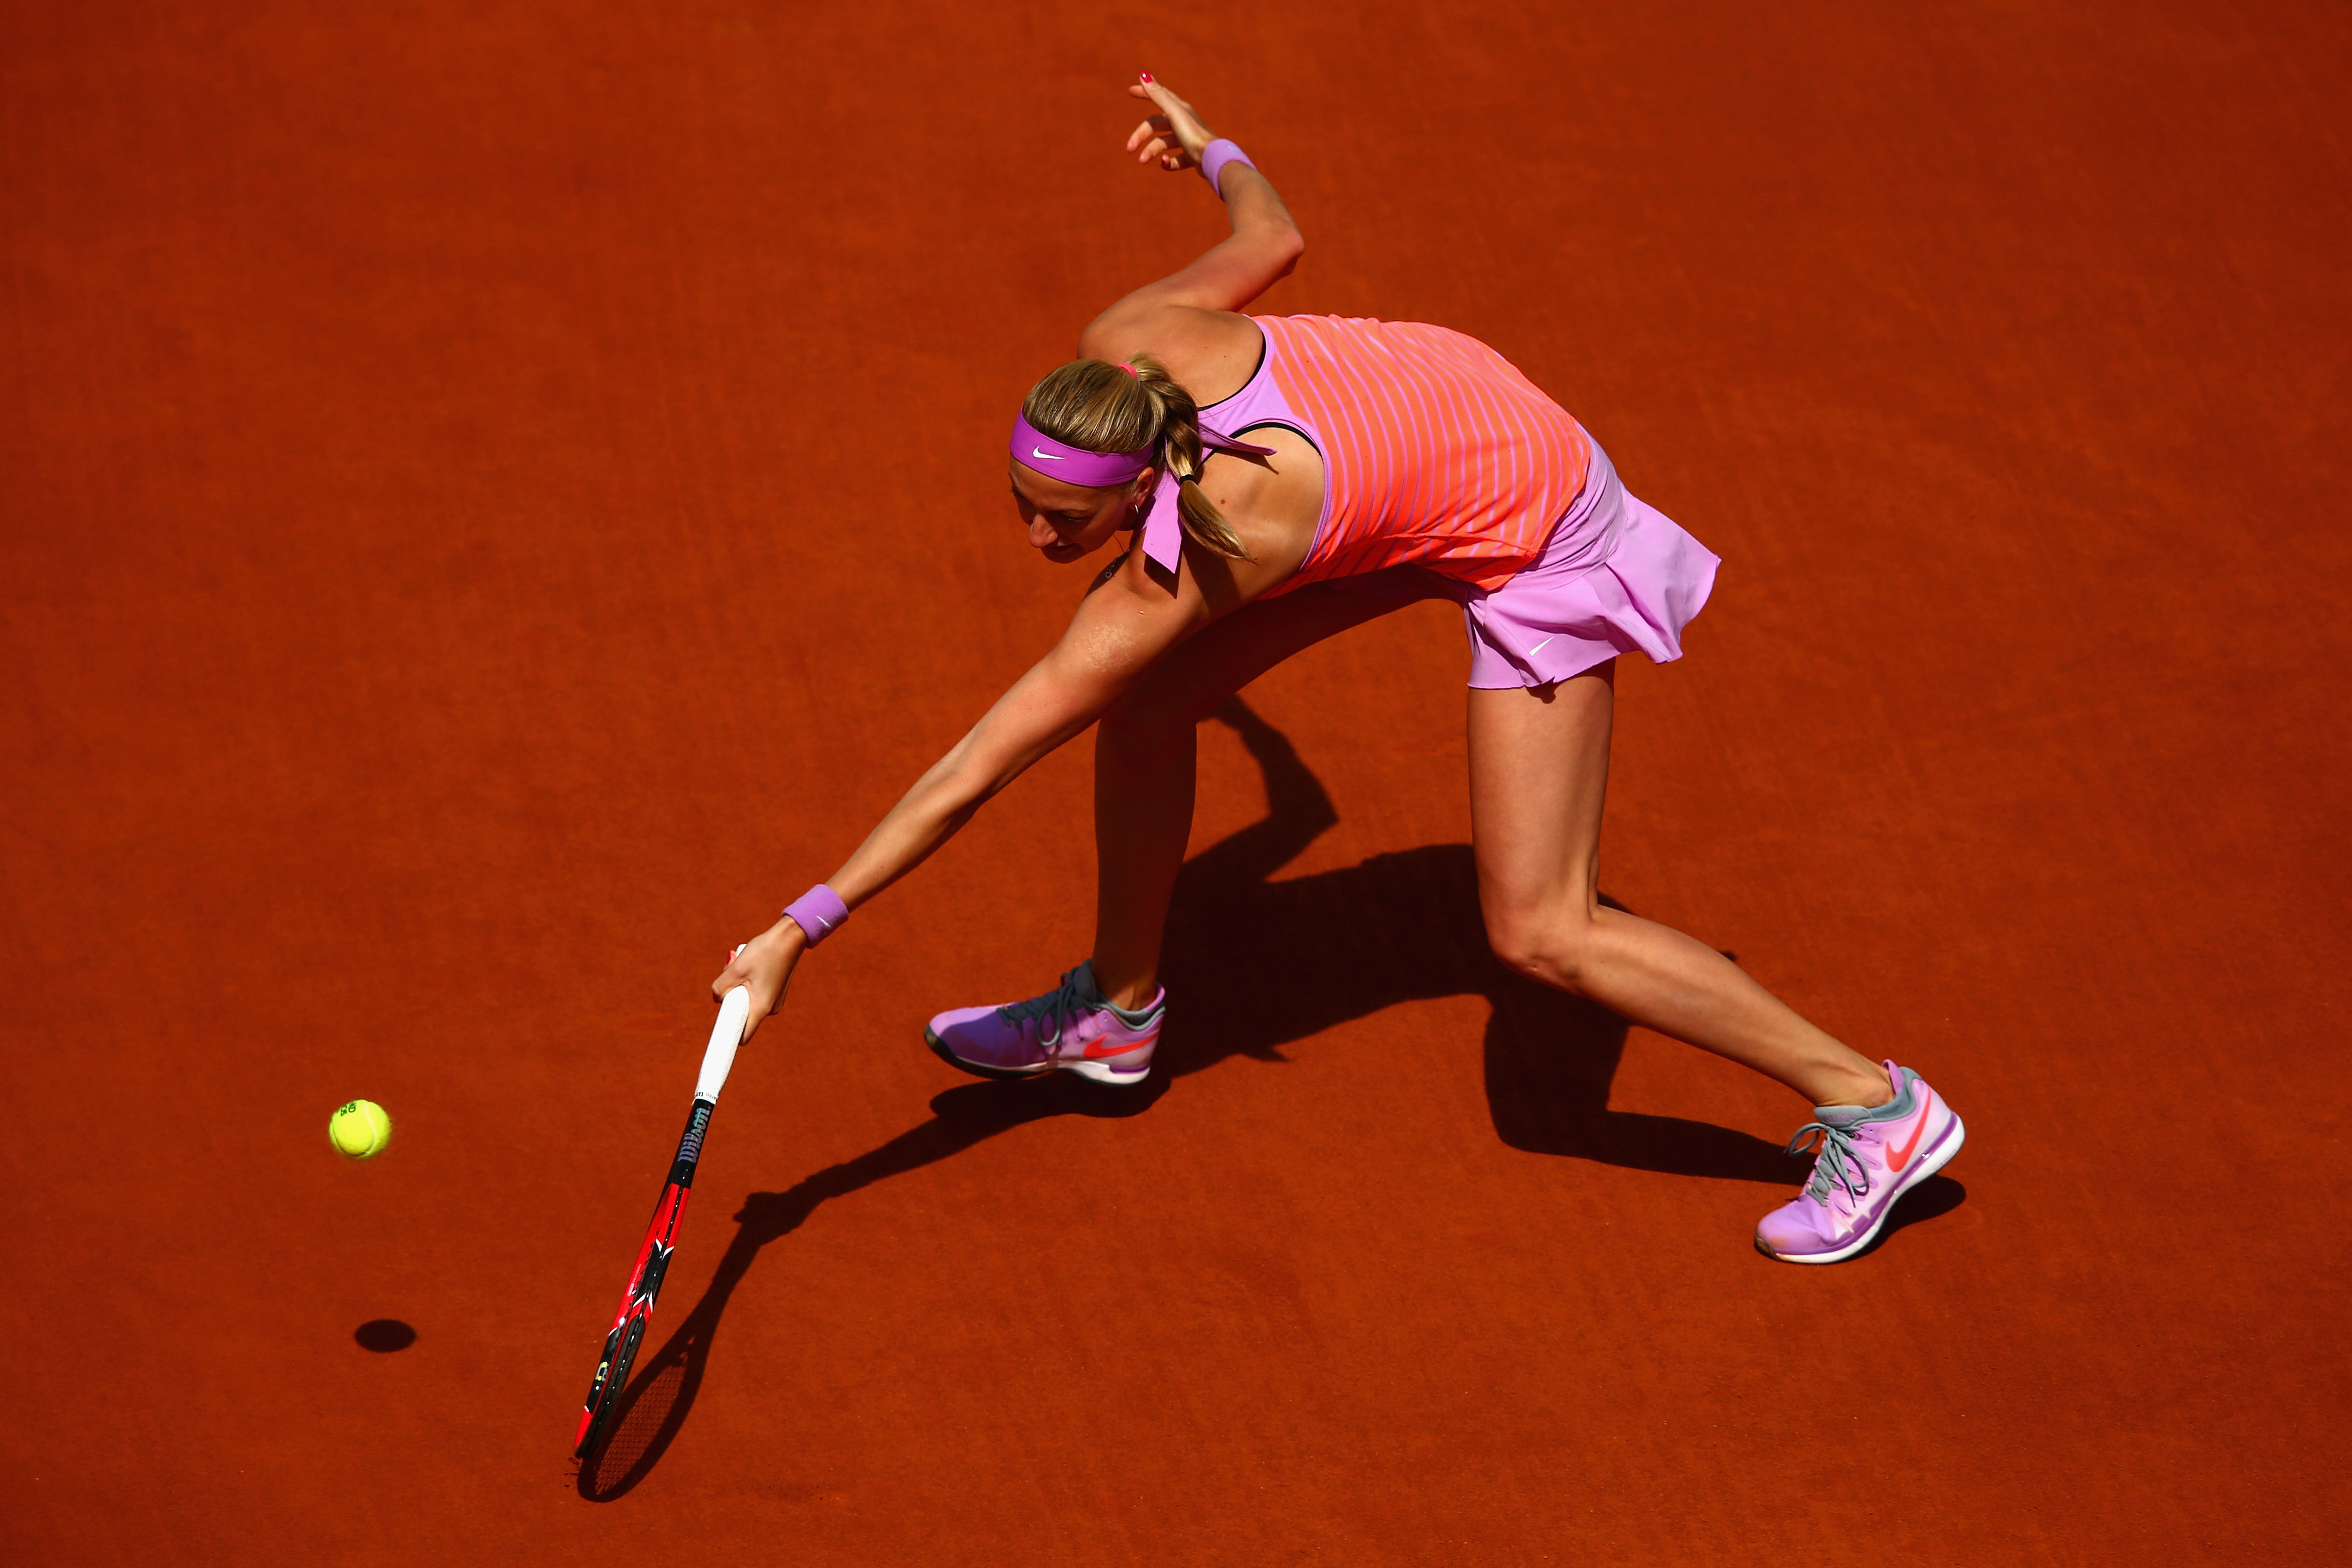 Kvitova is through to the fourth round with a 6–3, 6–2 win over Irina-Camelia Begu.